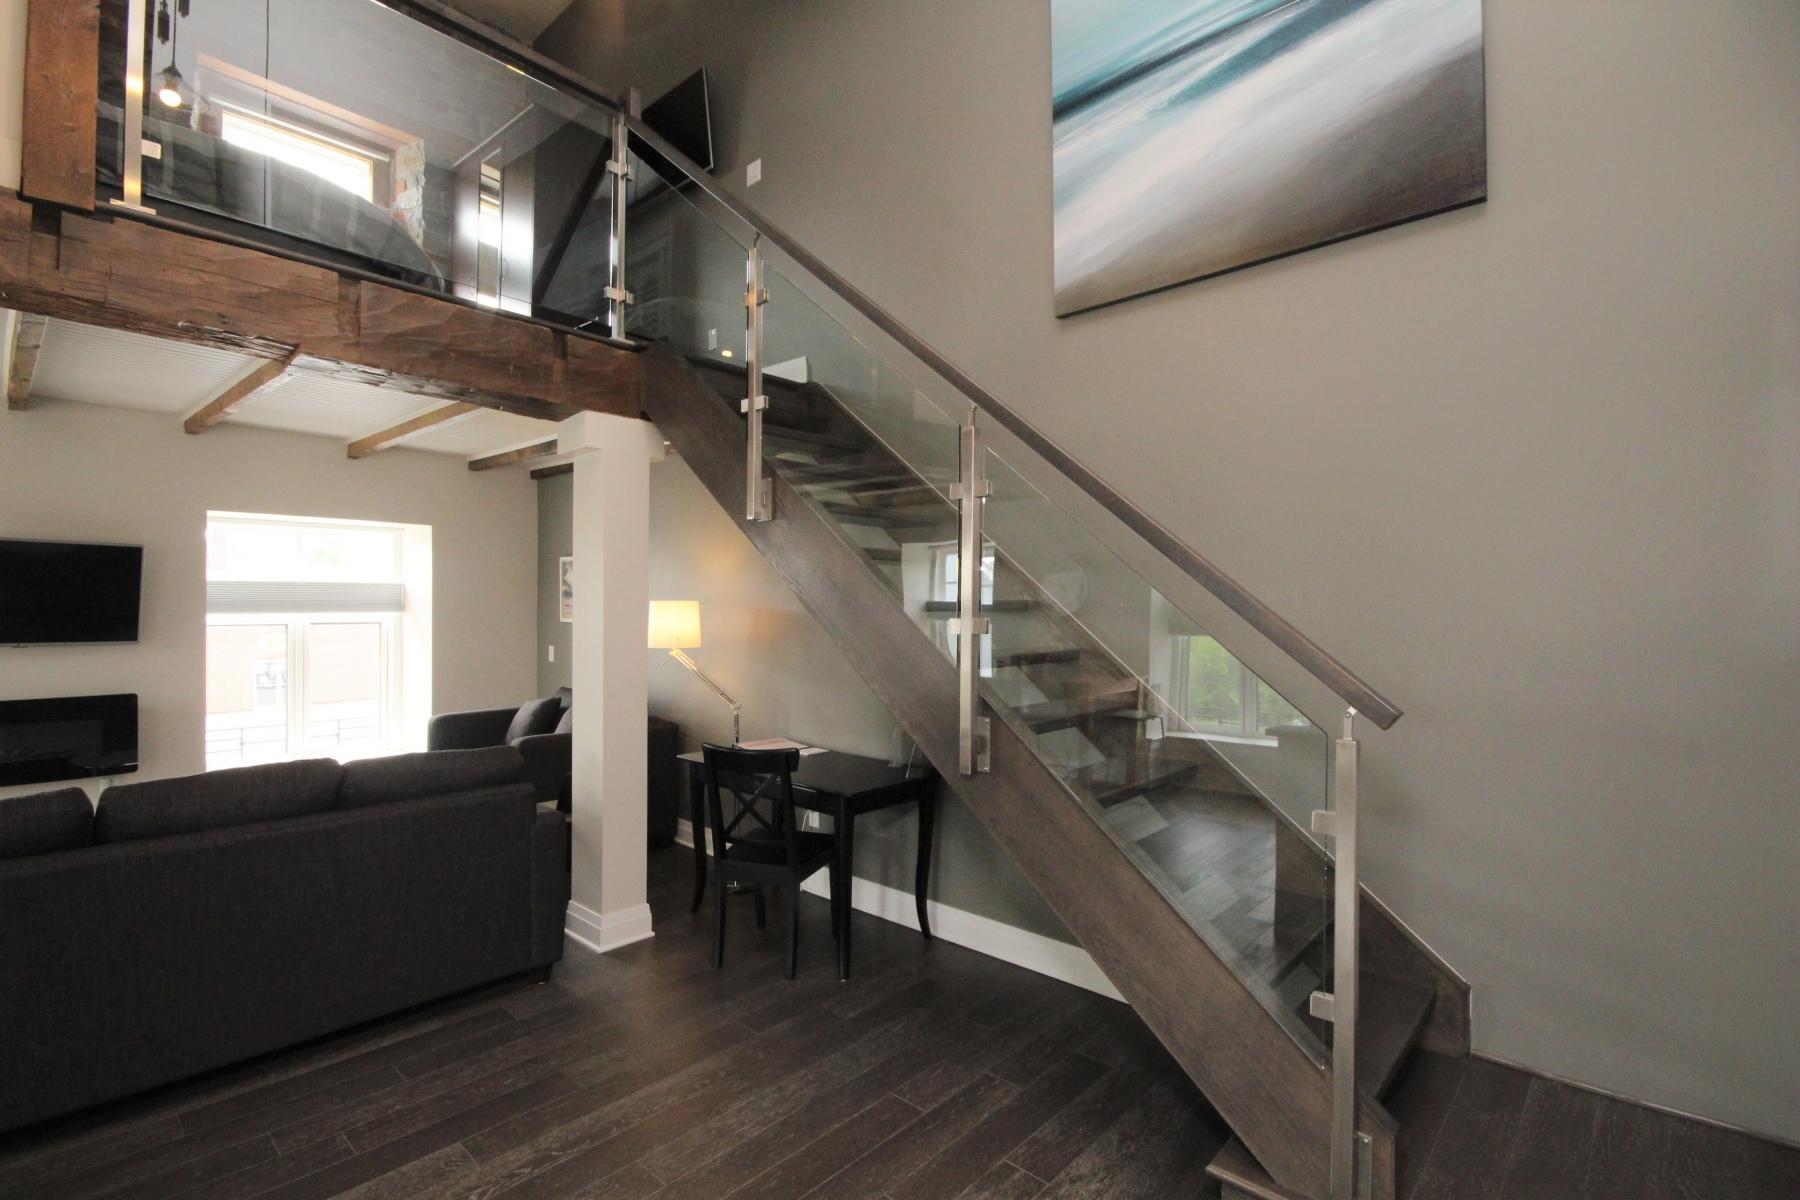 Loft Suite 1 - Stairs